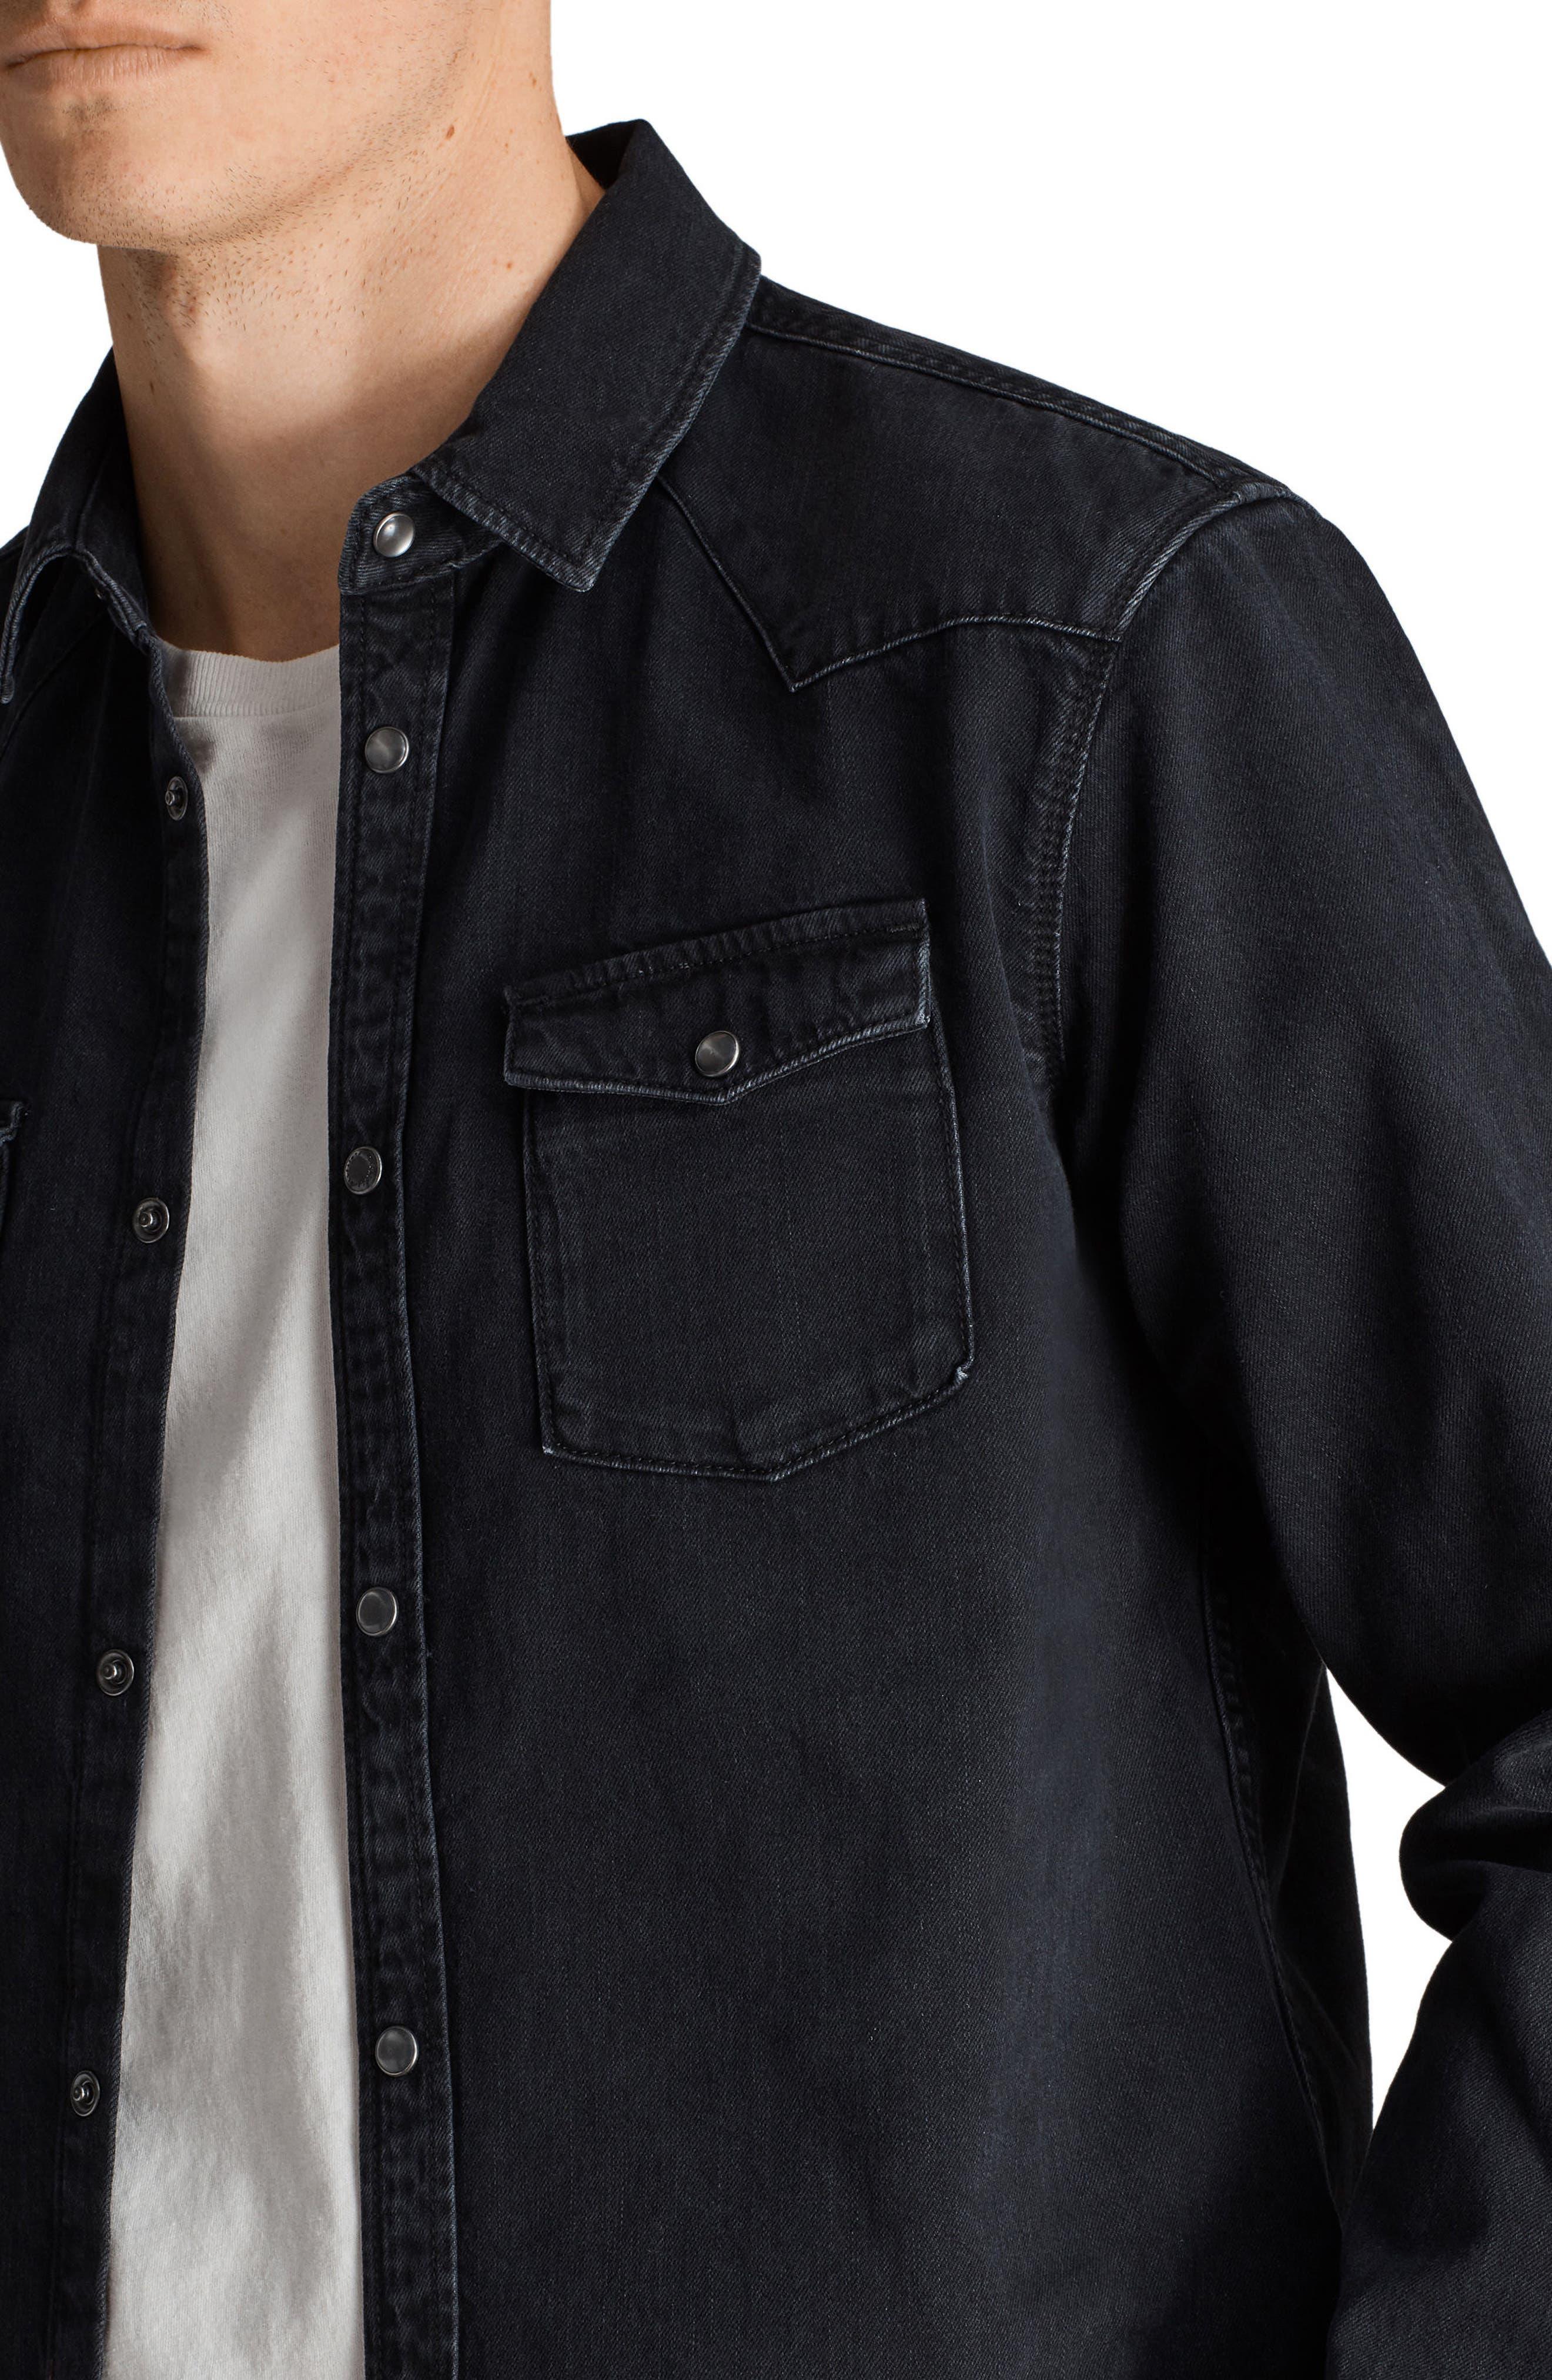 Beck Slim Fit Denim Sport Shirt,                             Alternate thumbnail 3, color,                             Black